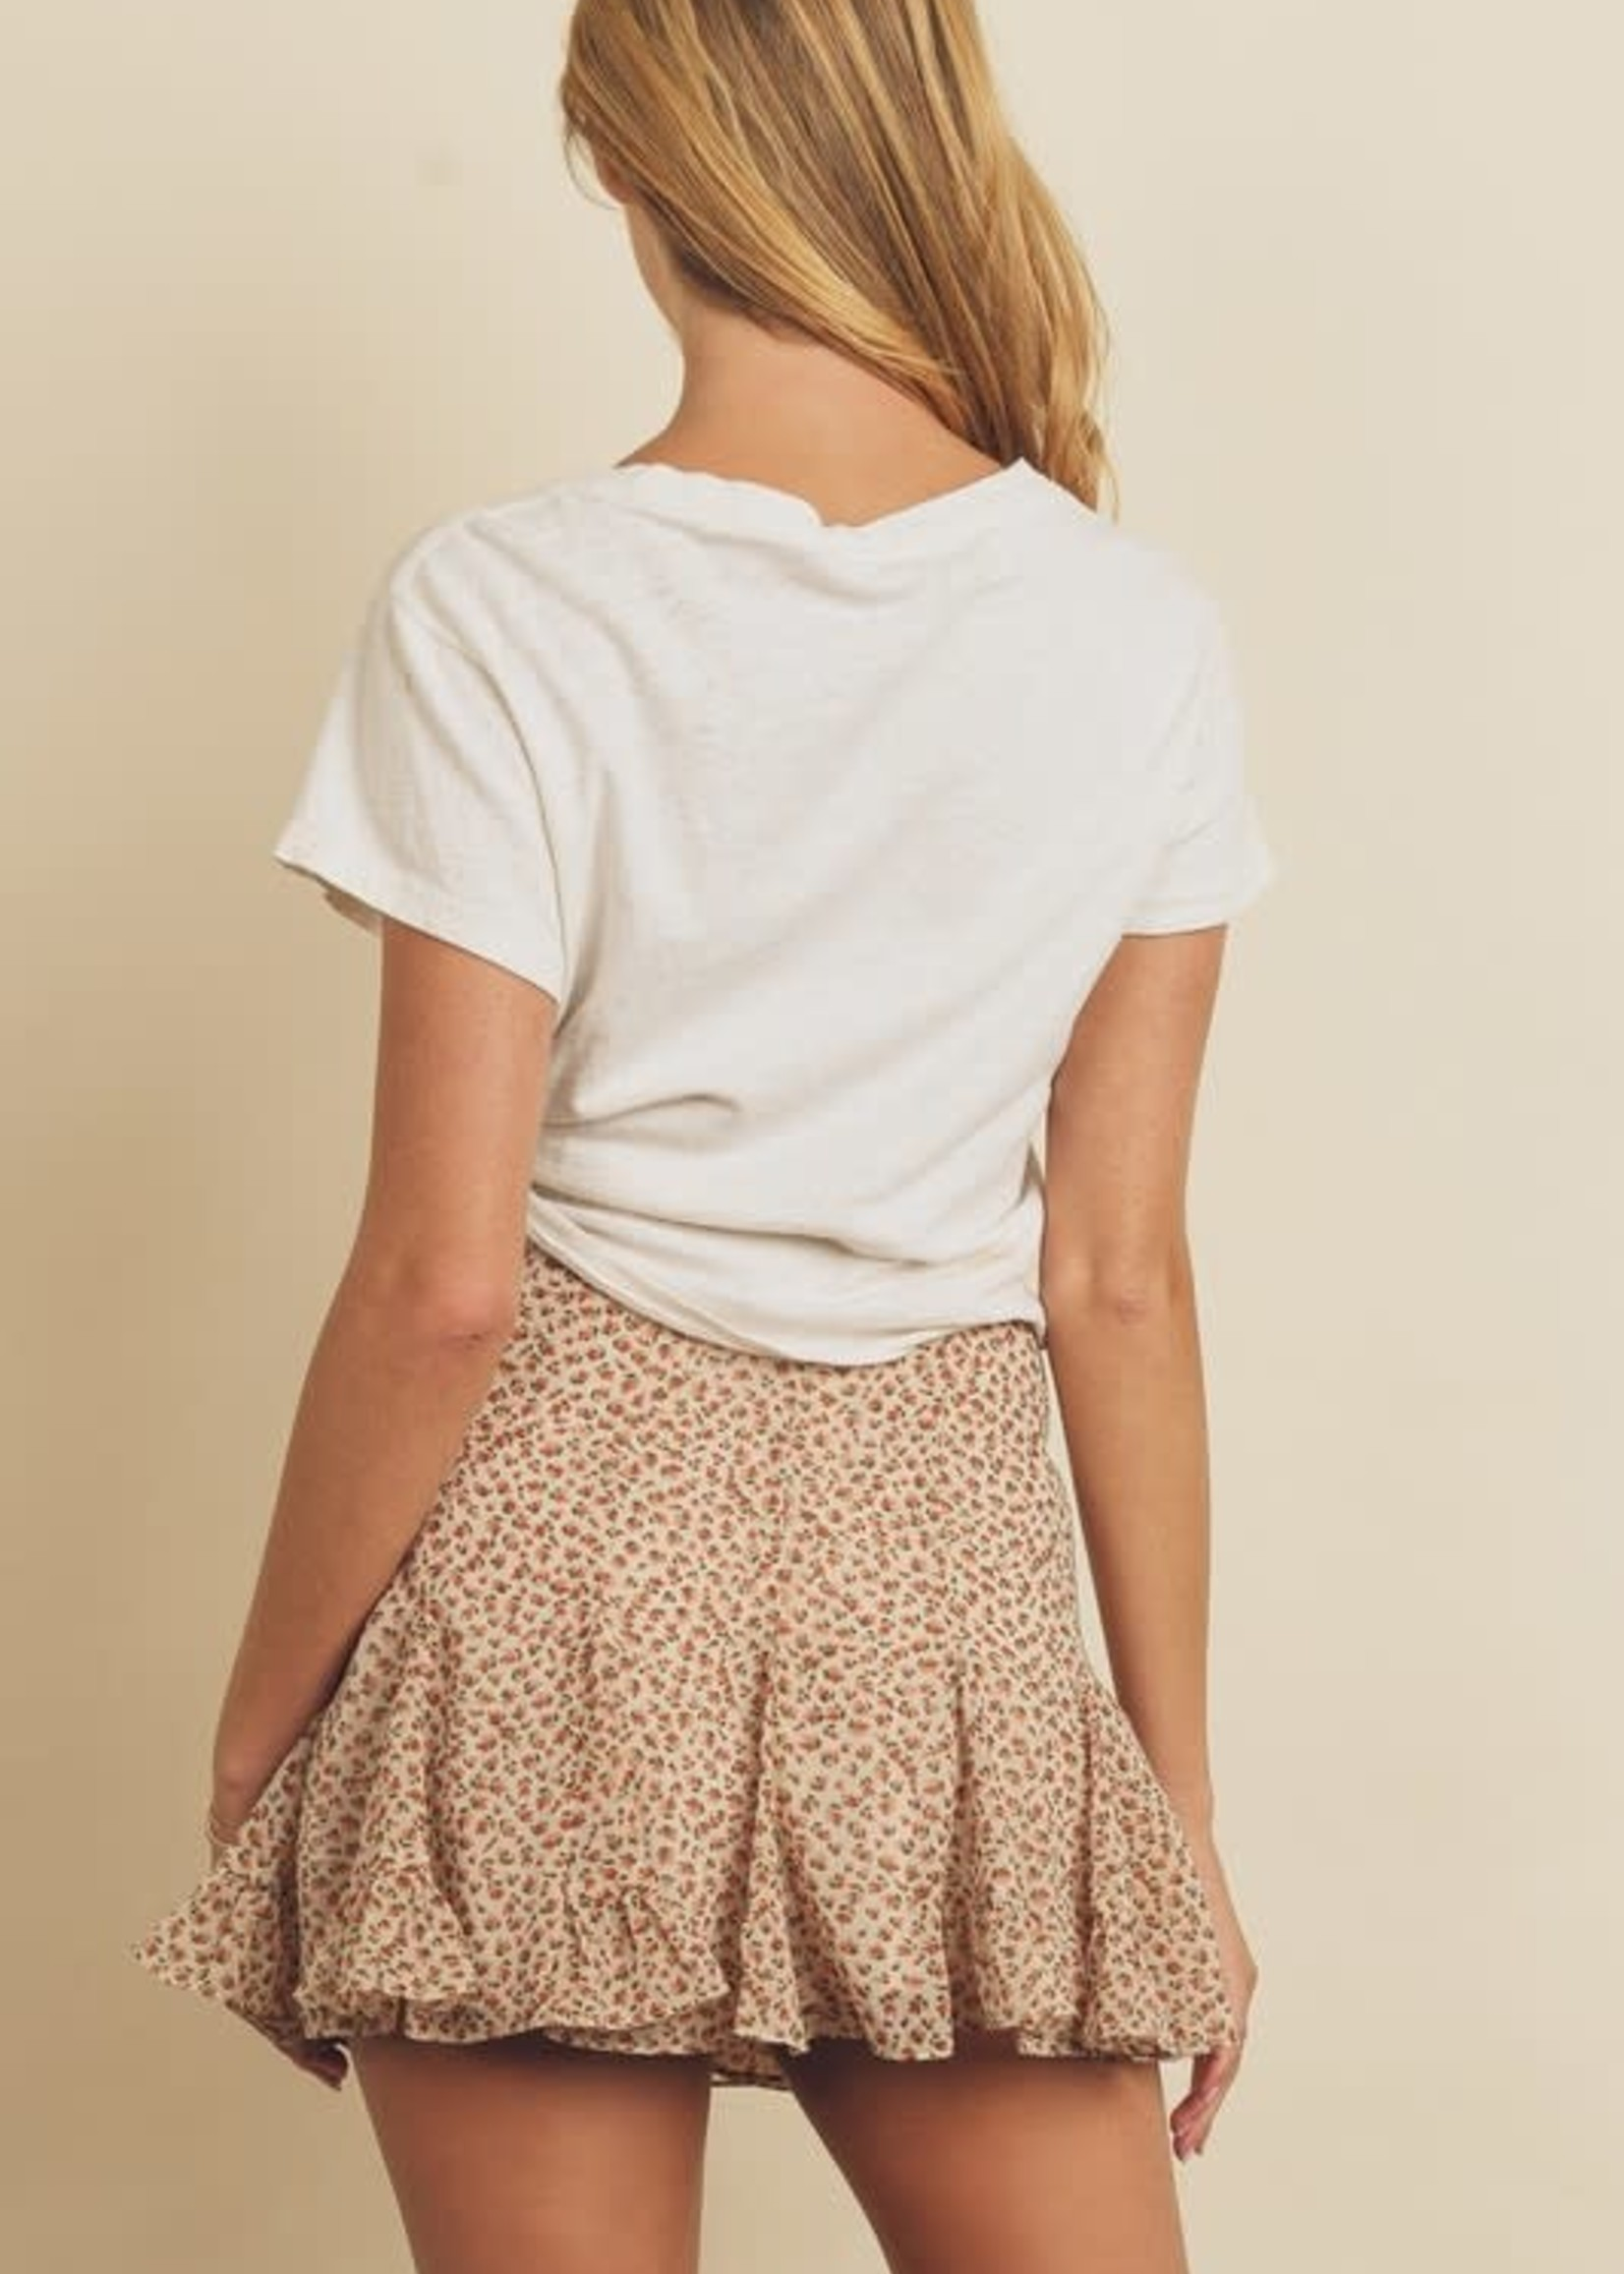 EM & ELLE Wreck my Plans Skirt